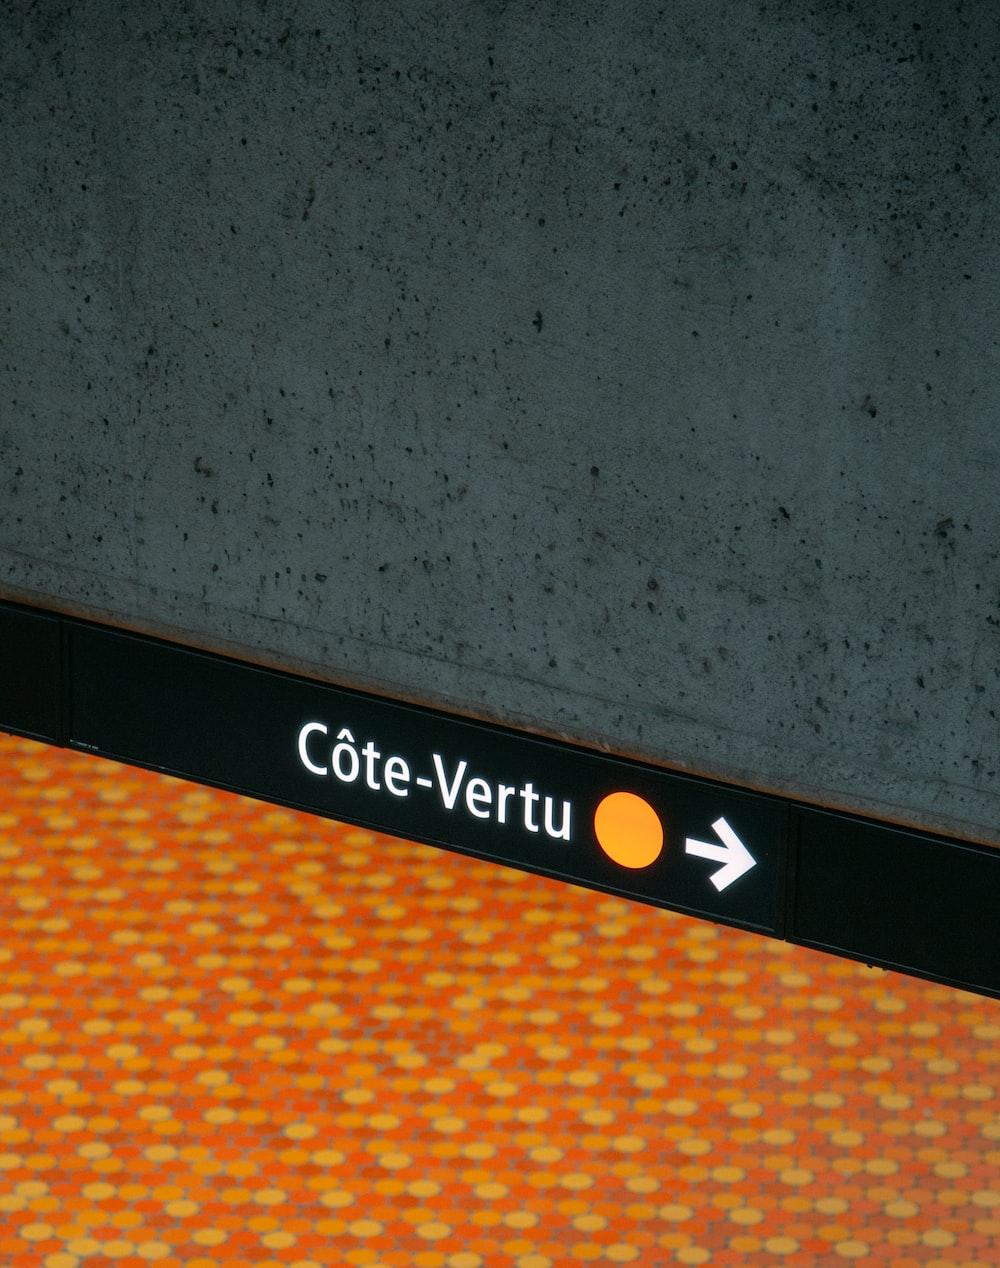 Cote-Vertu logo